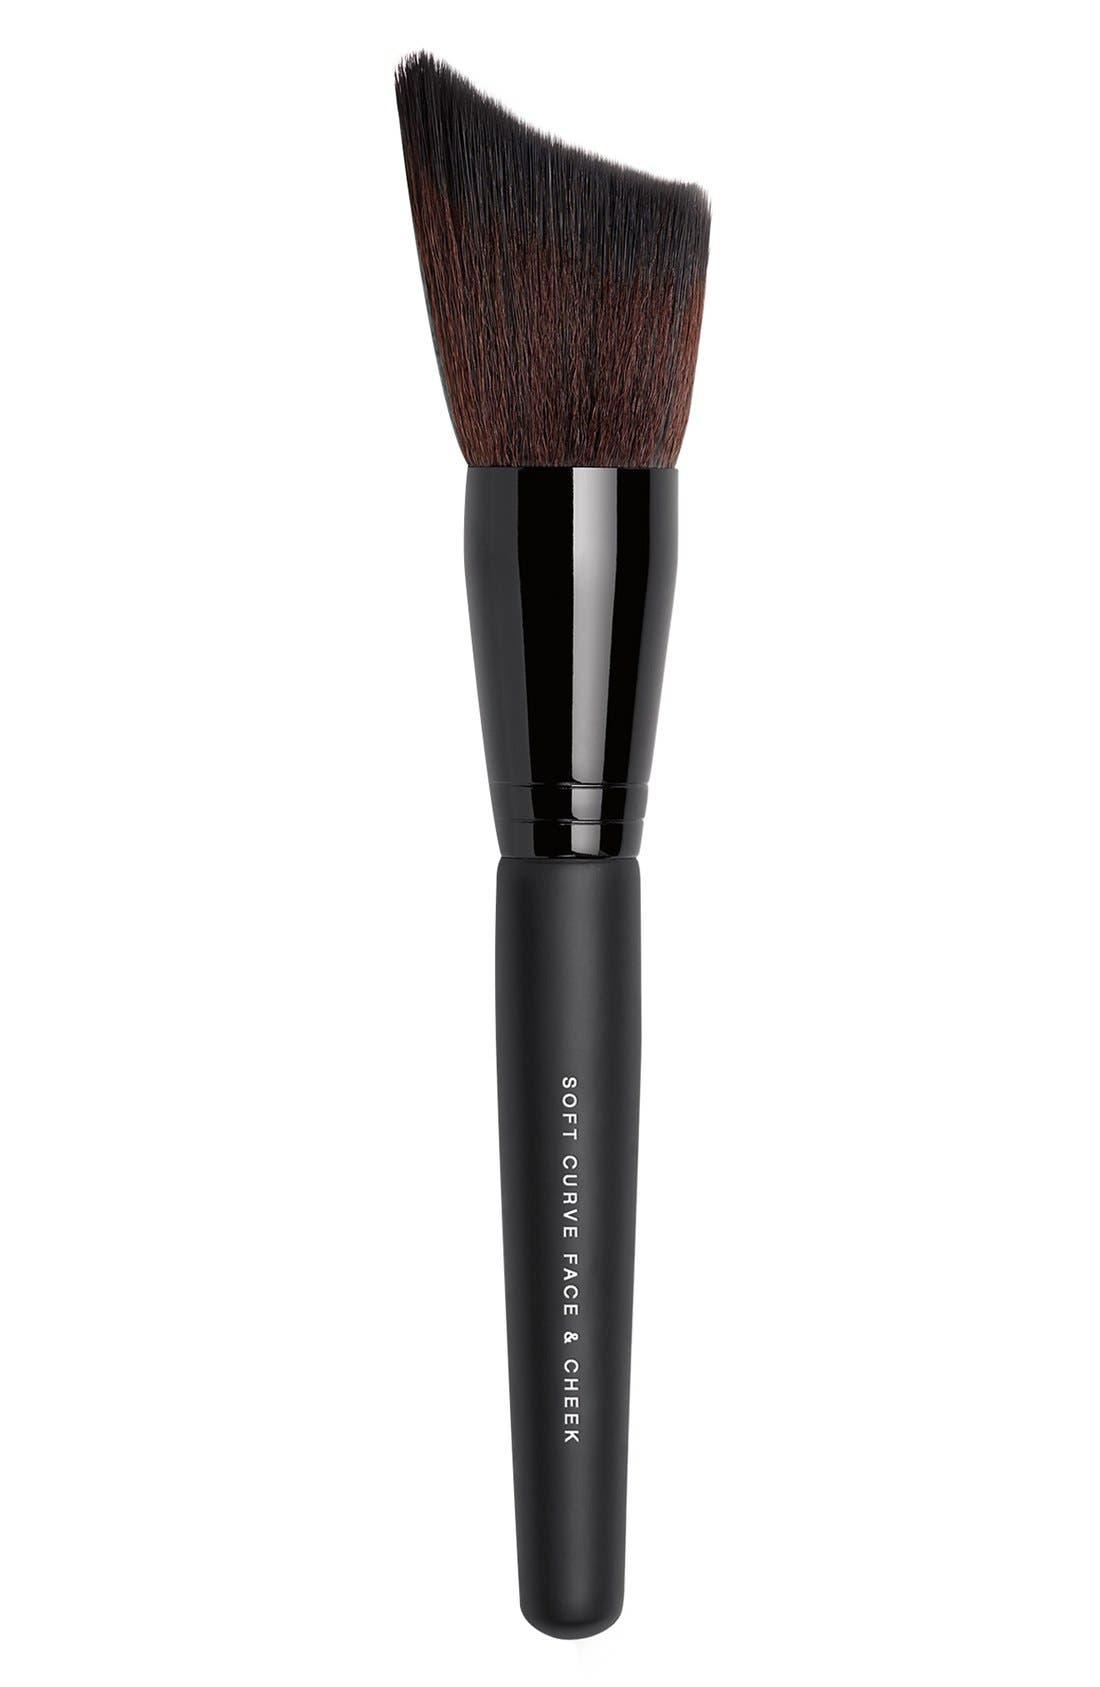 Soft Curve Face & Cheek Brush,                         Main,                         color, NO COLOR